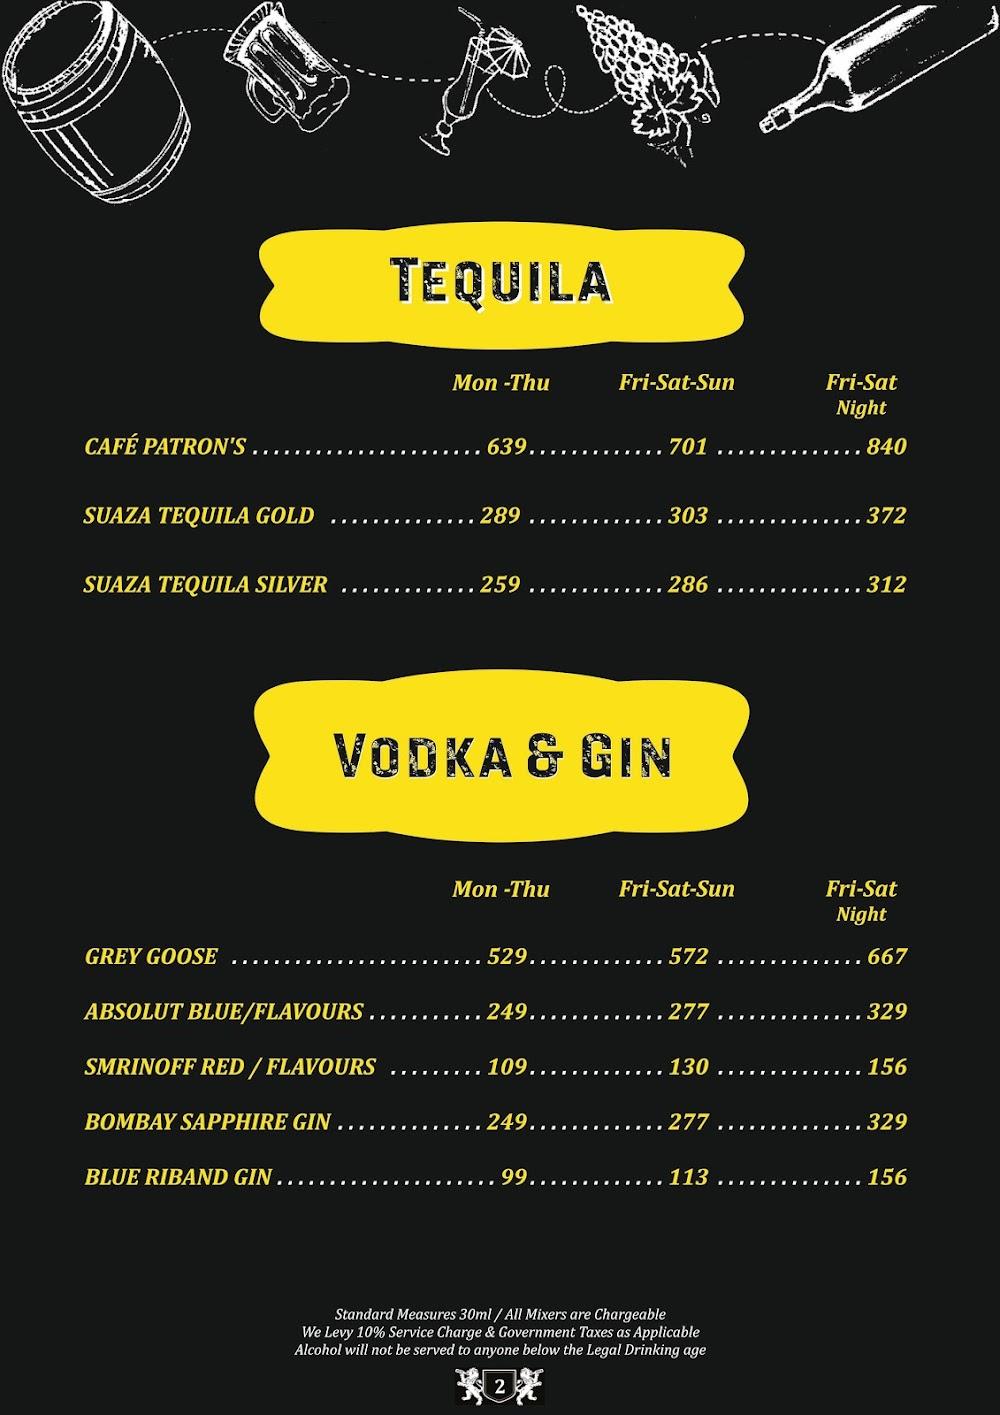 Road House Cafe Bar menu 2